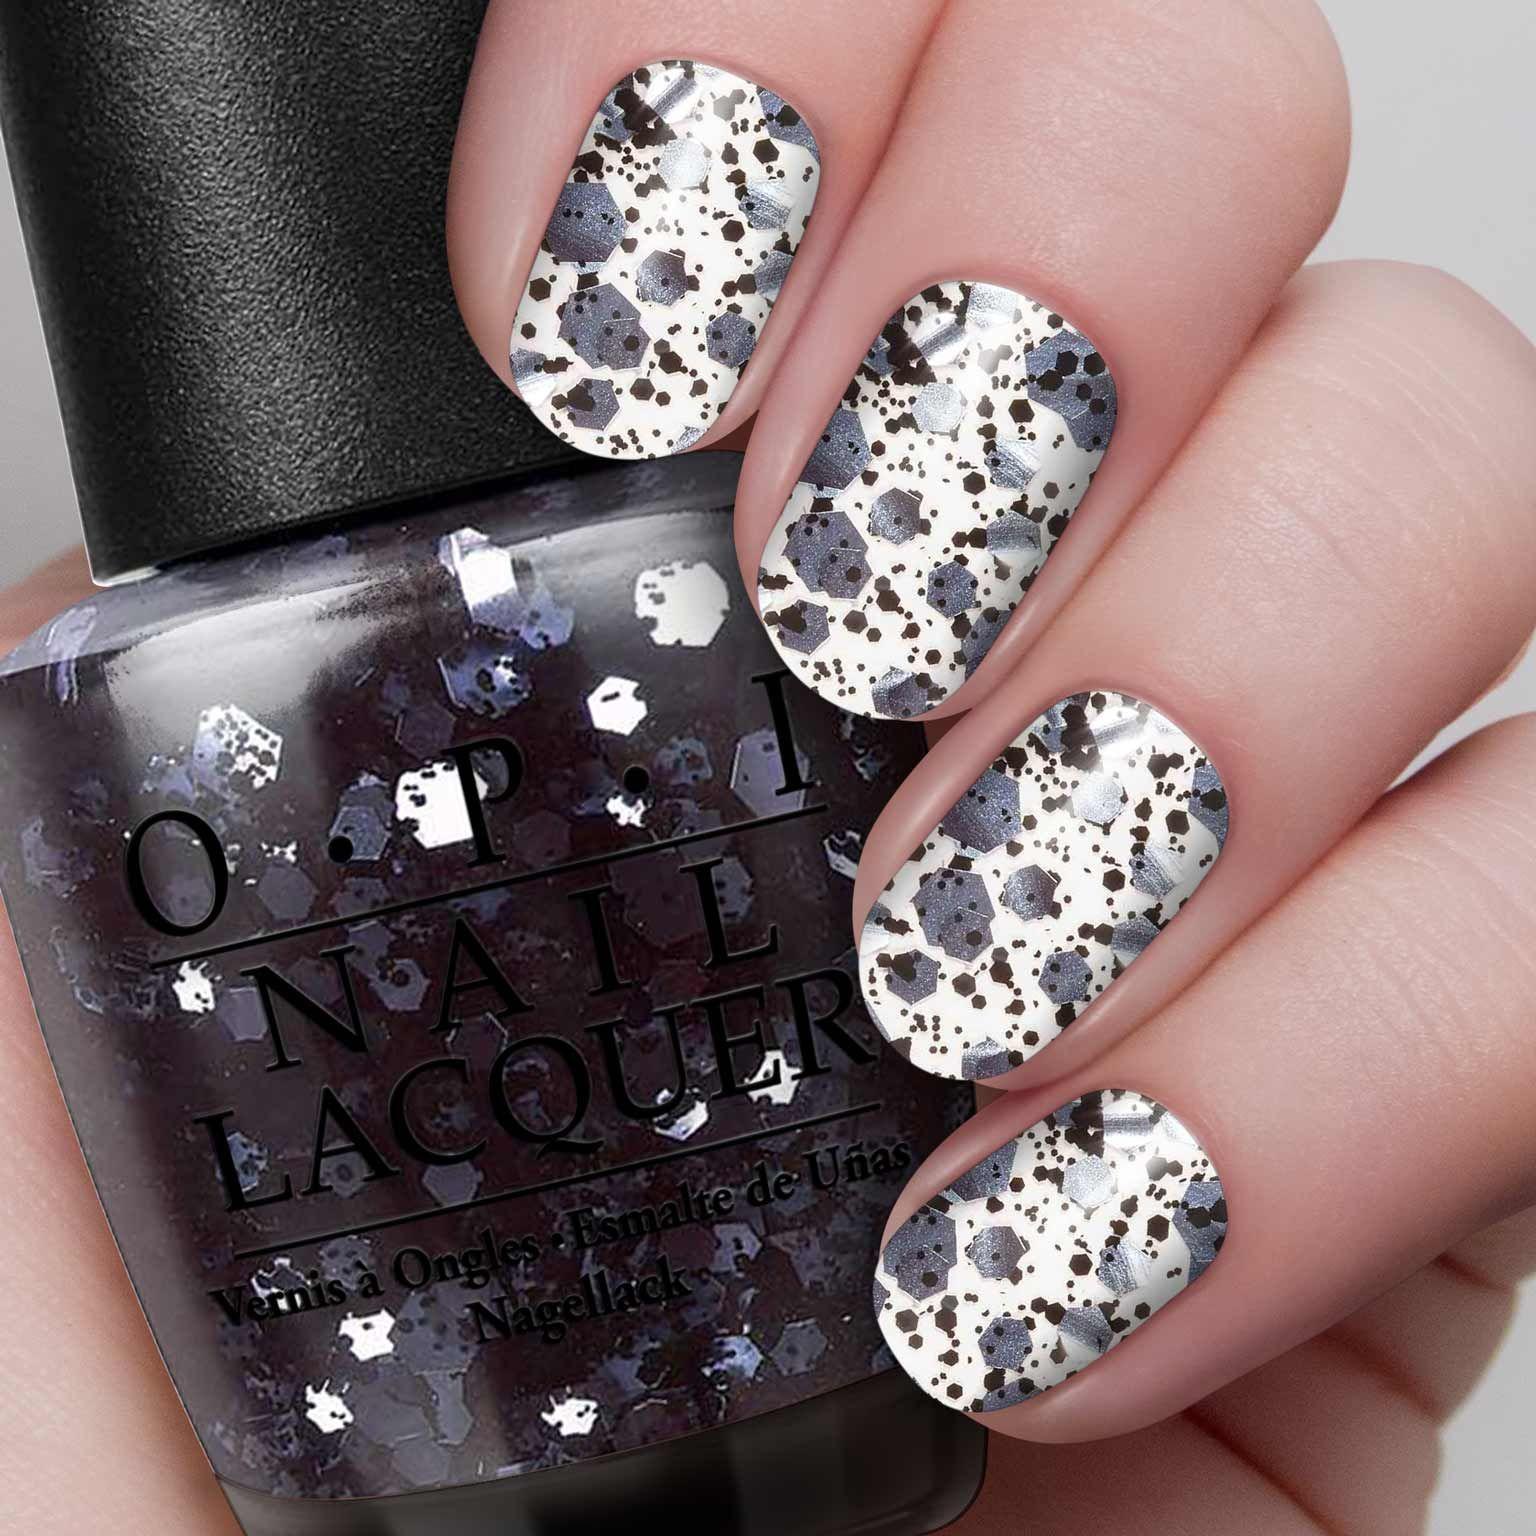 OPI So Elegant #OPIGWEN #OPILovers #nails #christmas #holiday ...